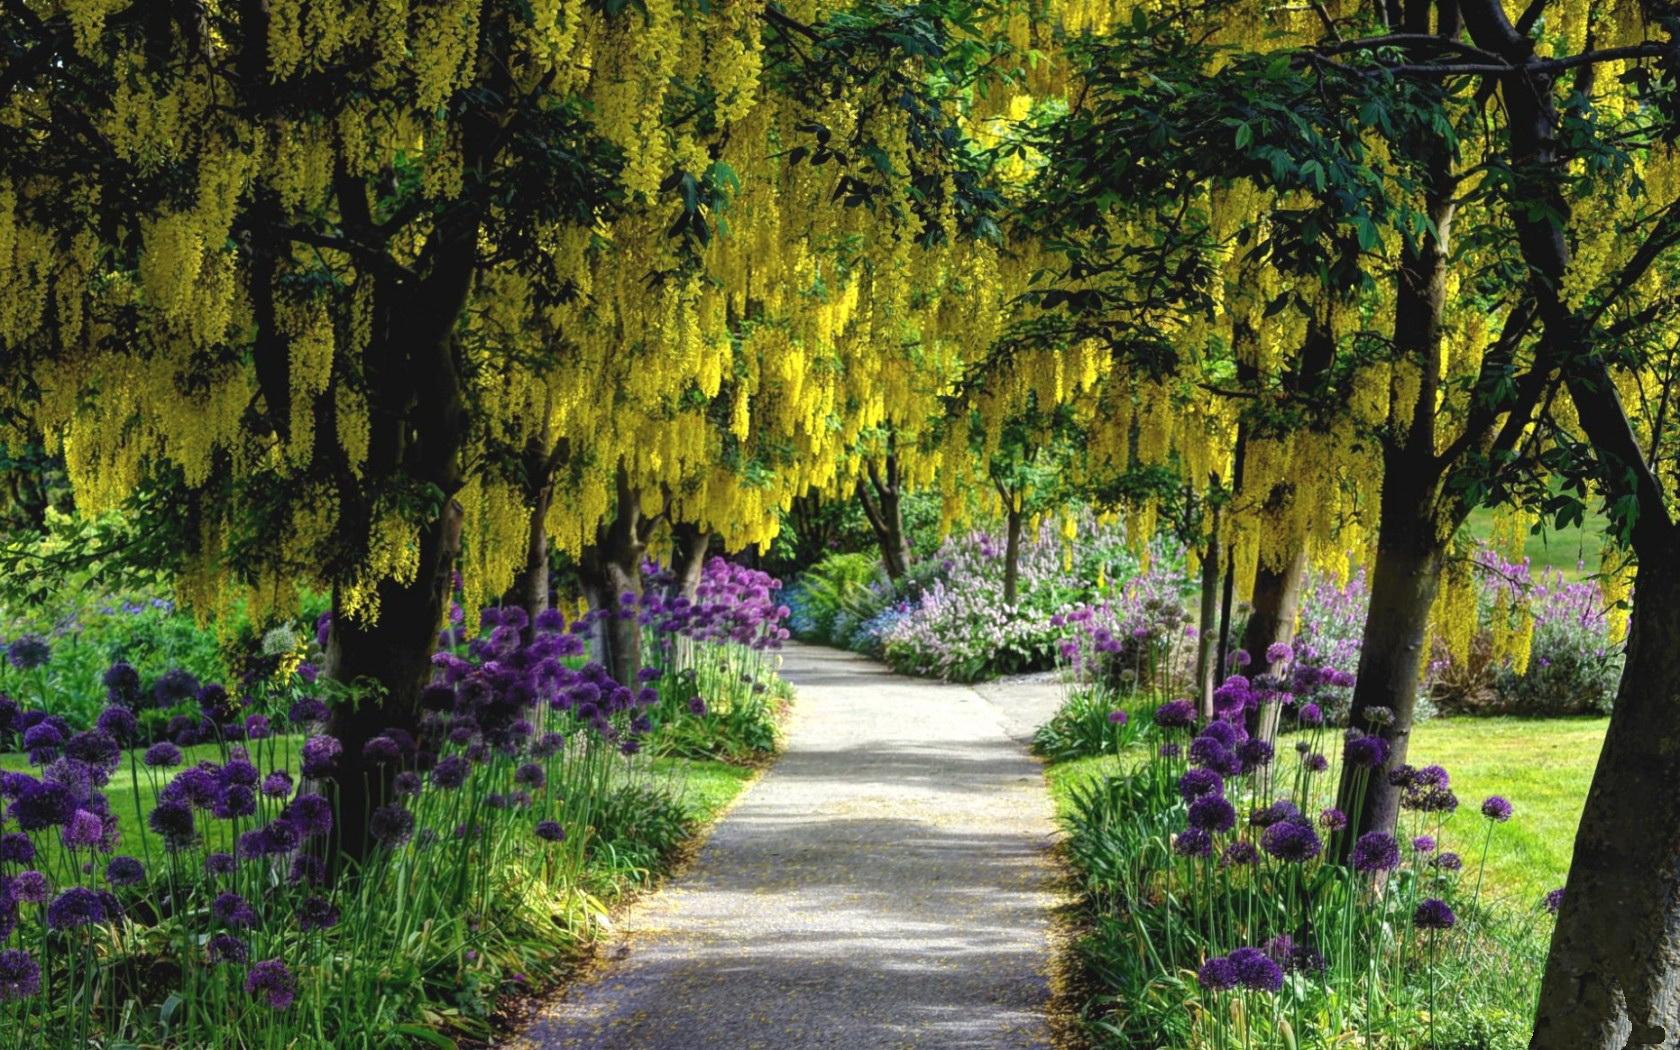 Jardin fonds d 39 cran arri res plan 1680x1050 id 417453 - Fond d ecran jardin anglais ...